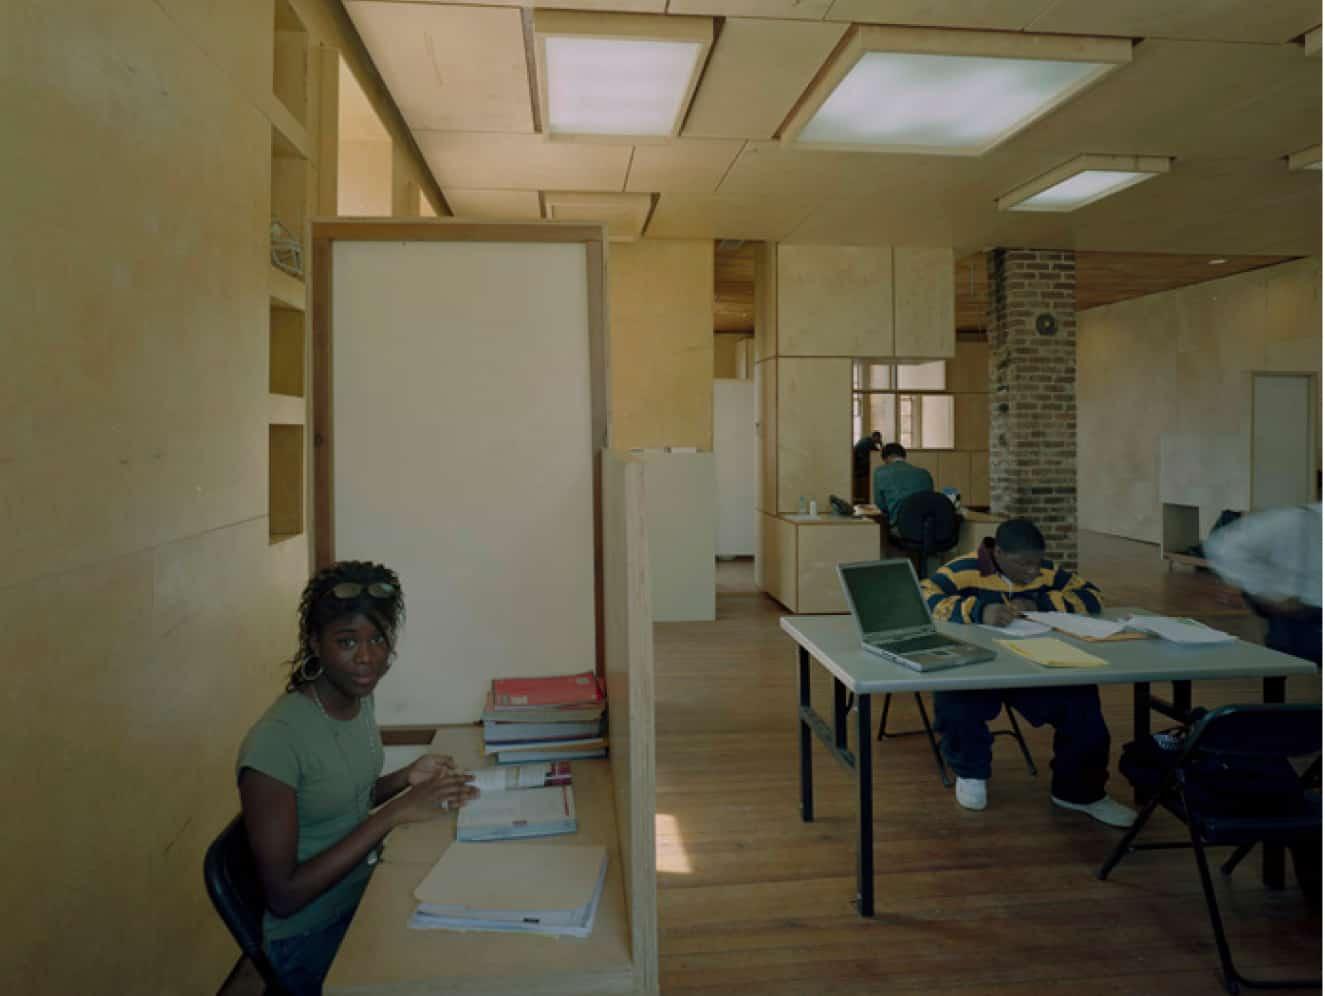 student at desk looking at the camera